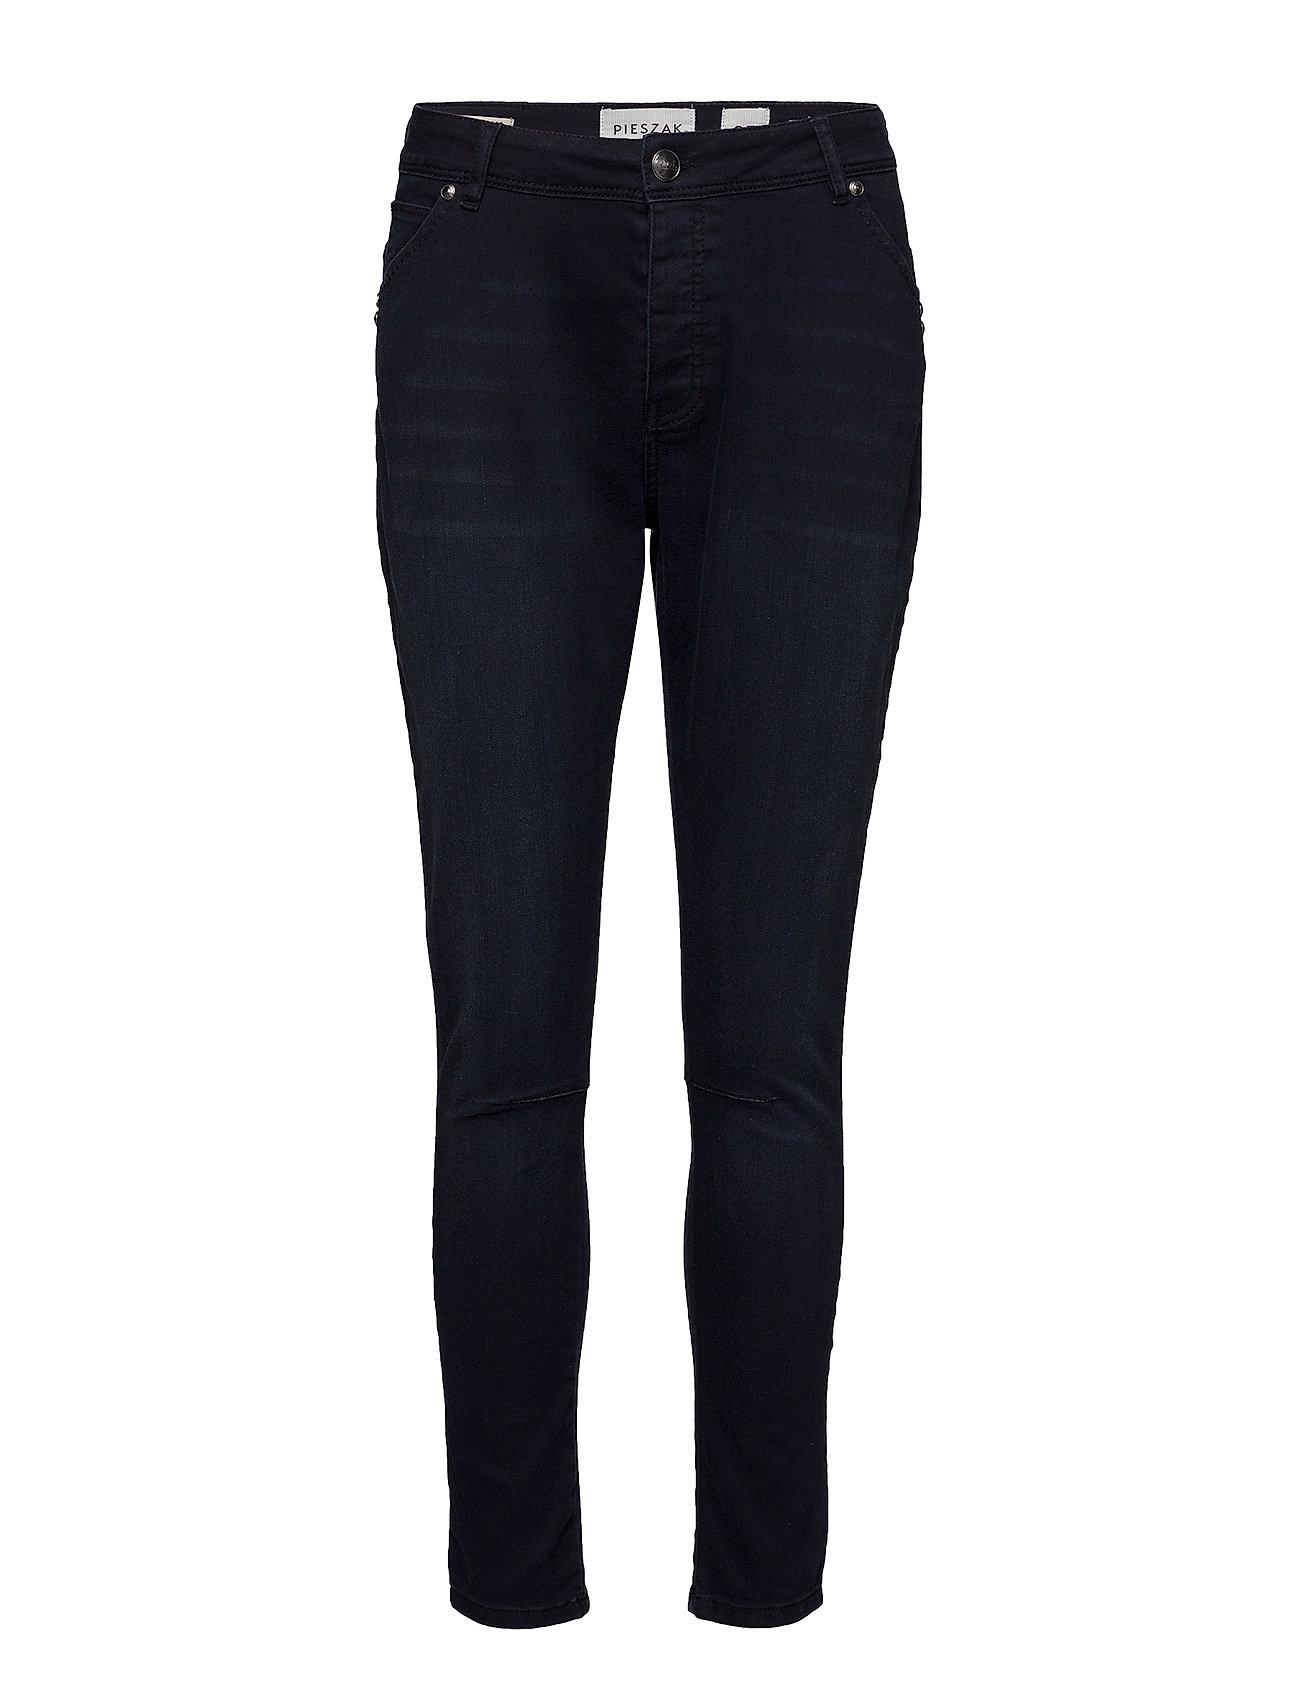 Pieszak Bianca jeans blue black - BLUEBLACK